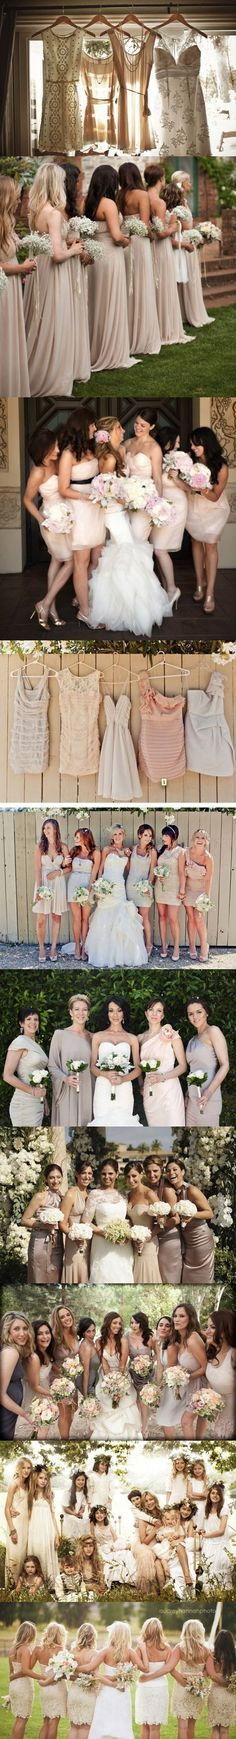 #bridesmaiddresses #beige #swansondiamondcenter pretty neutrals of every shade! beige, blush, champagne, ivory, cream, tan, khaki, bridesmaids dresses. YES YES YES YES YES YES YES YES YES.